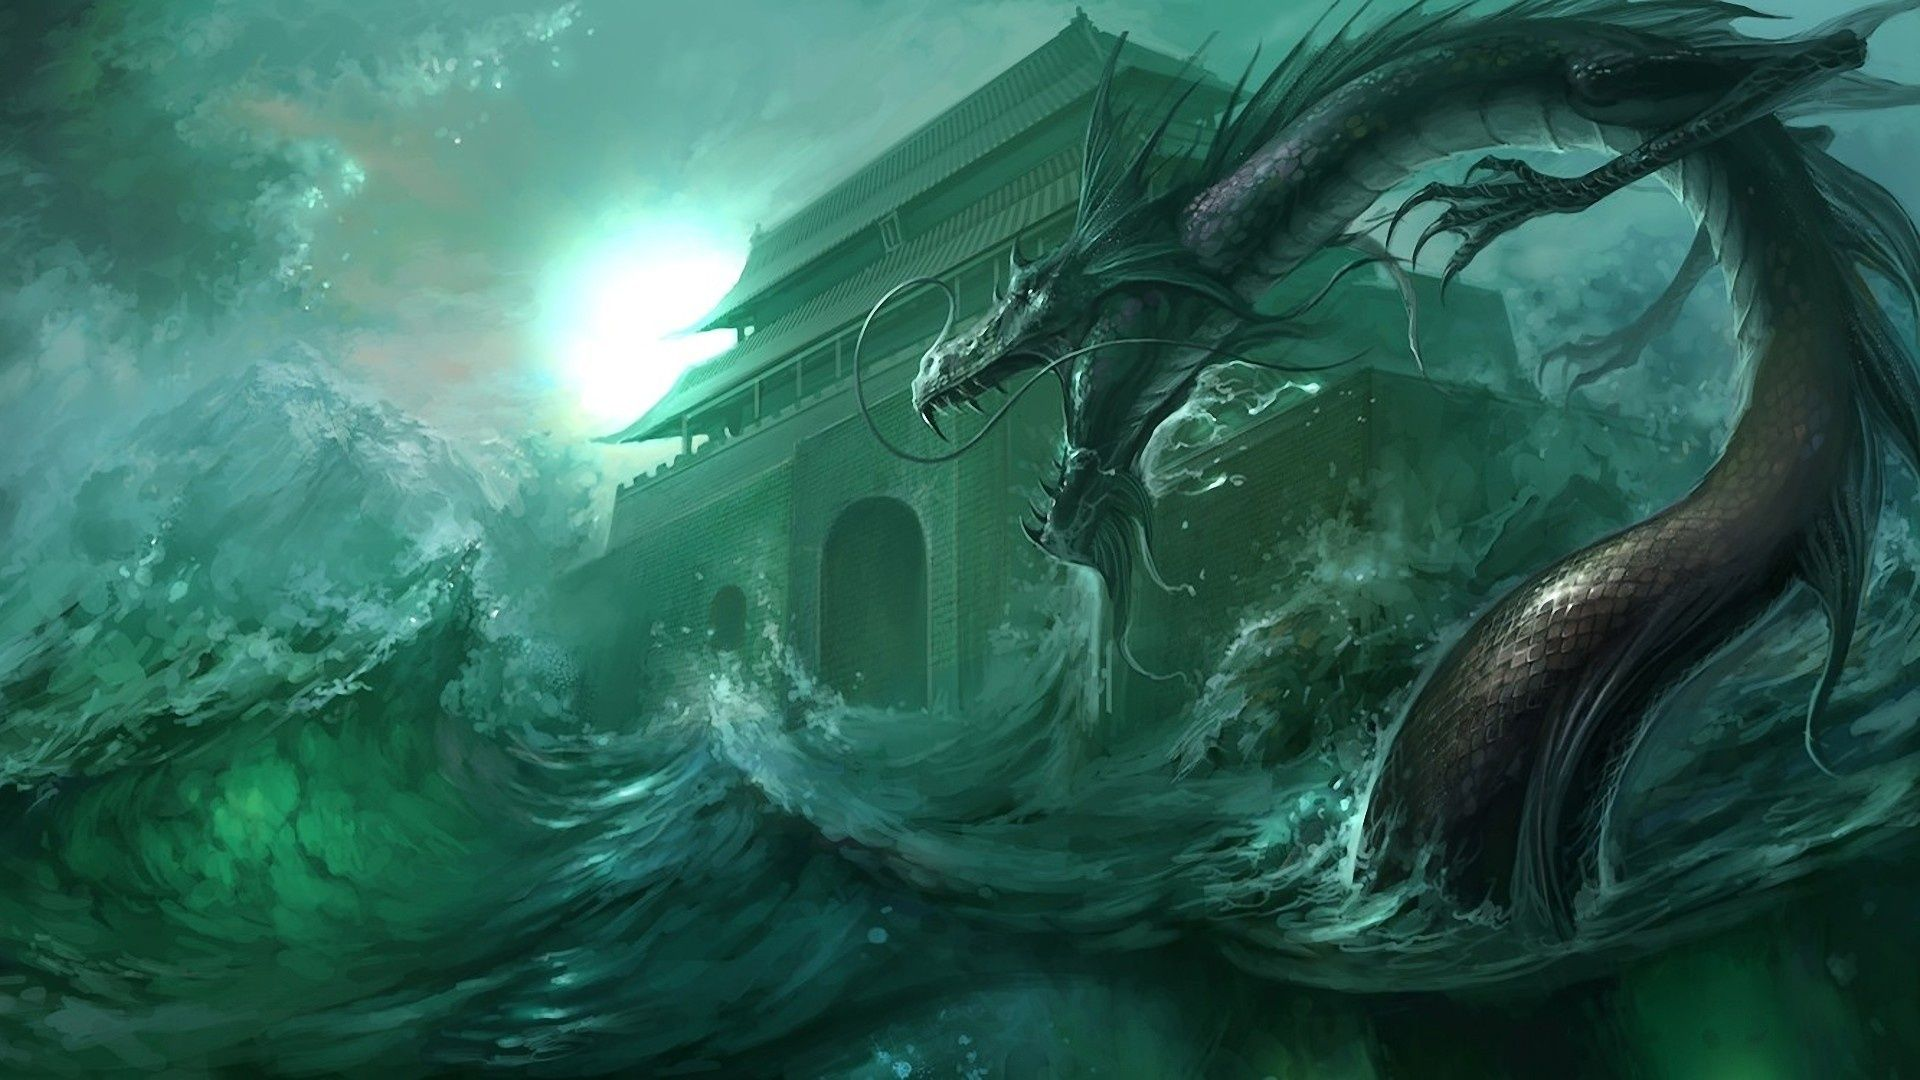 Fantasy Creature Wallpaper Water Dragon Dragon Images Sea Monsters